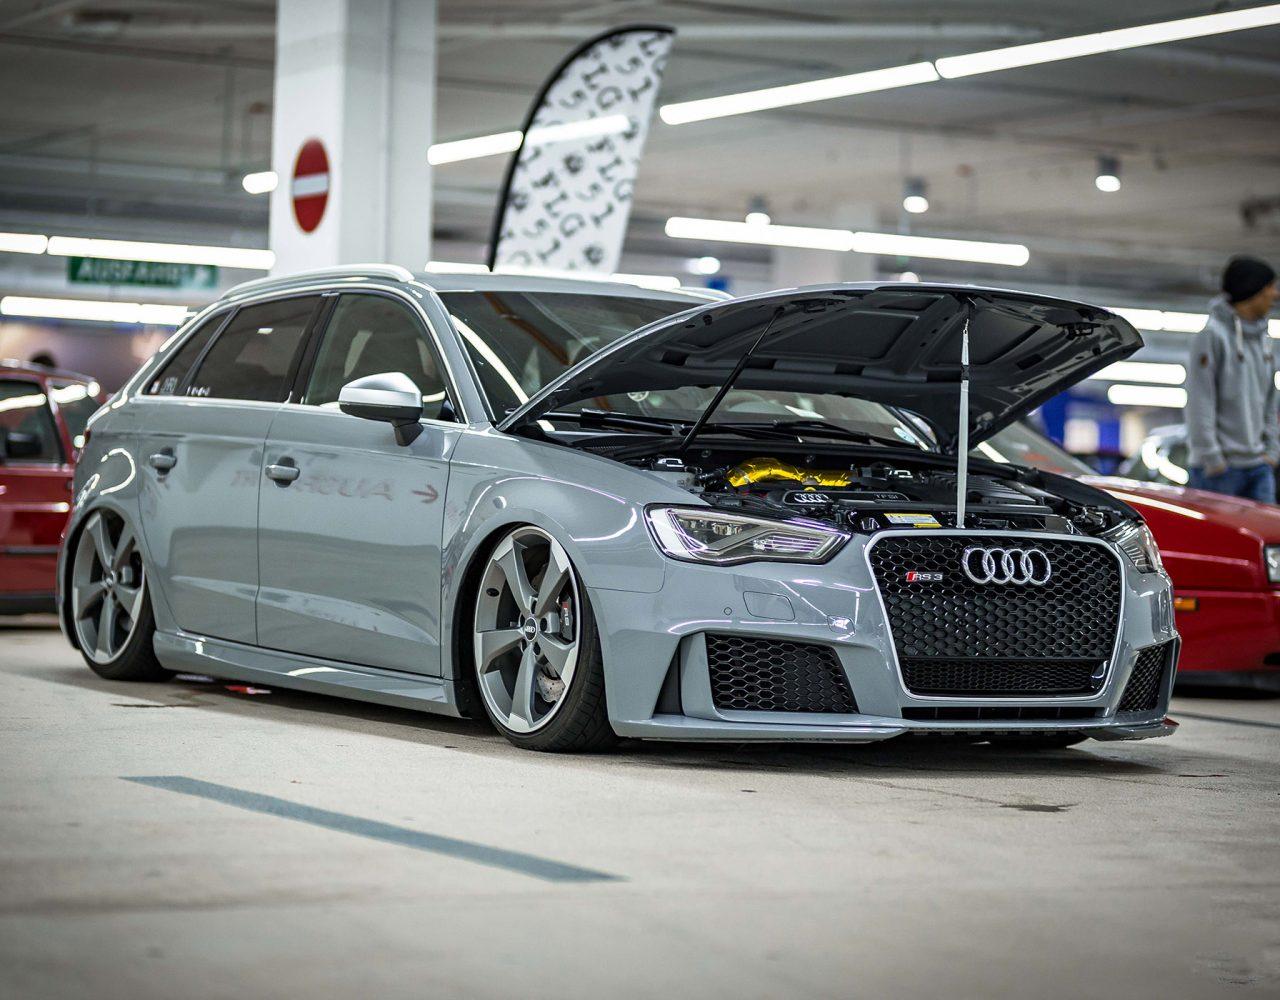 Audi_s3_Automotive_Photography